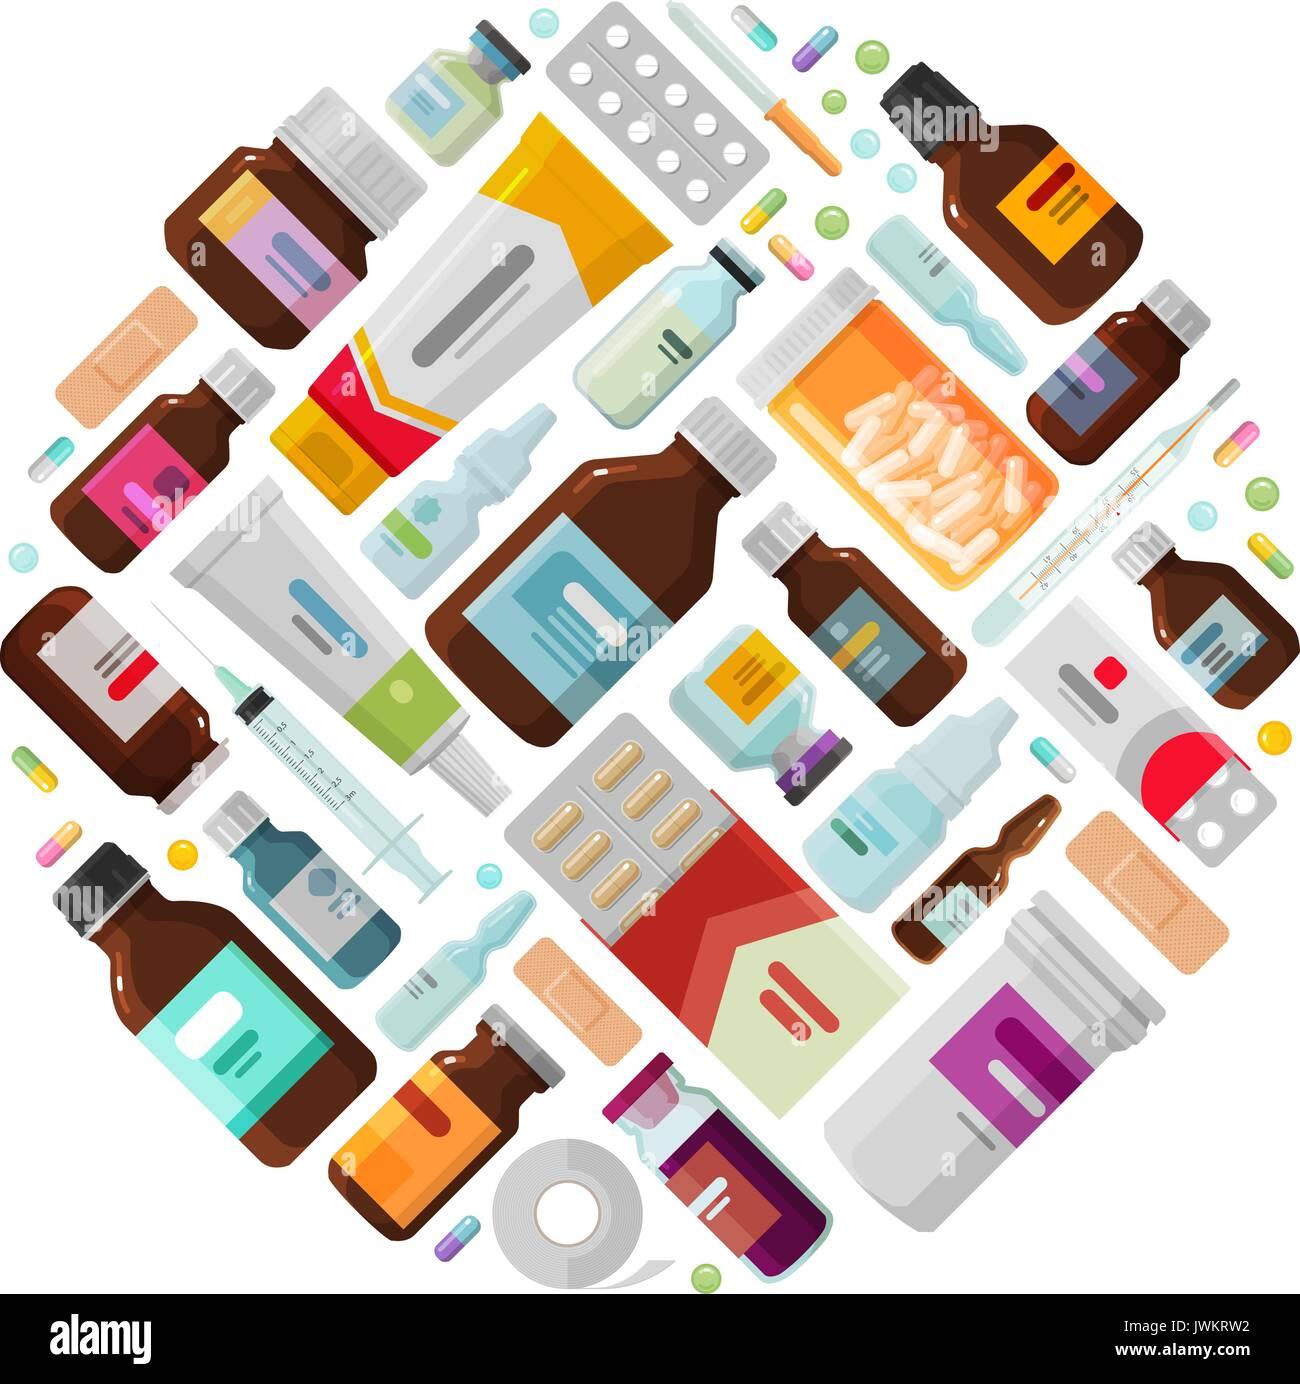 Medizin Konzept. Drogen, Medikamente, Flaschen und Pillen Icons. Vector Illustration Stockbild